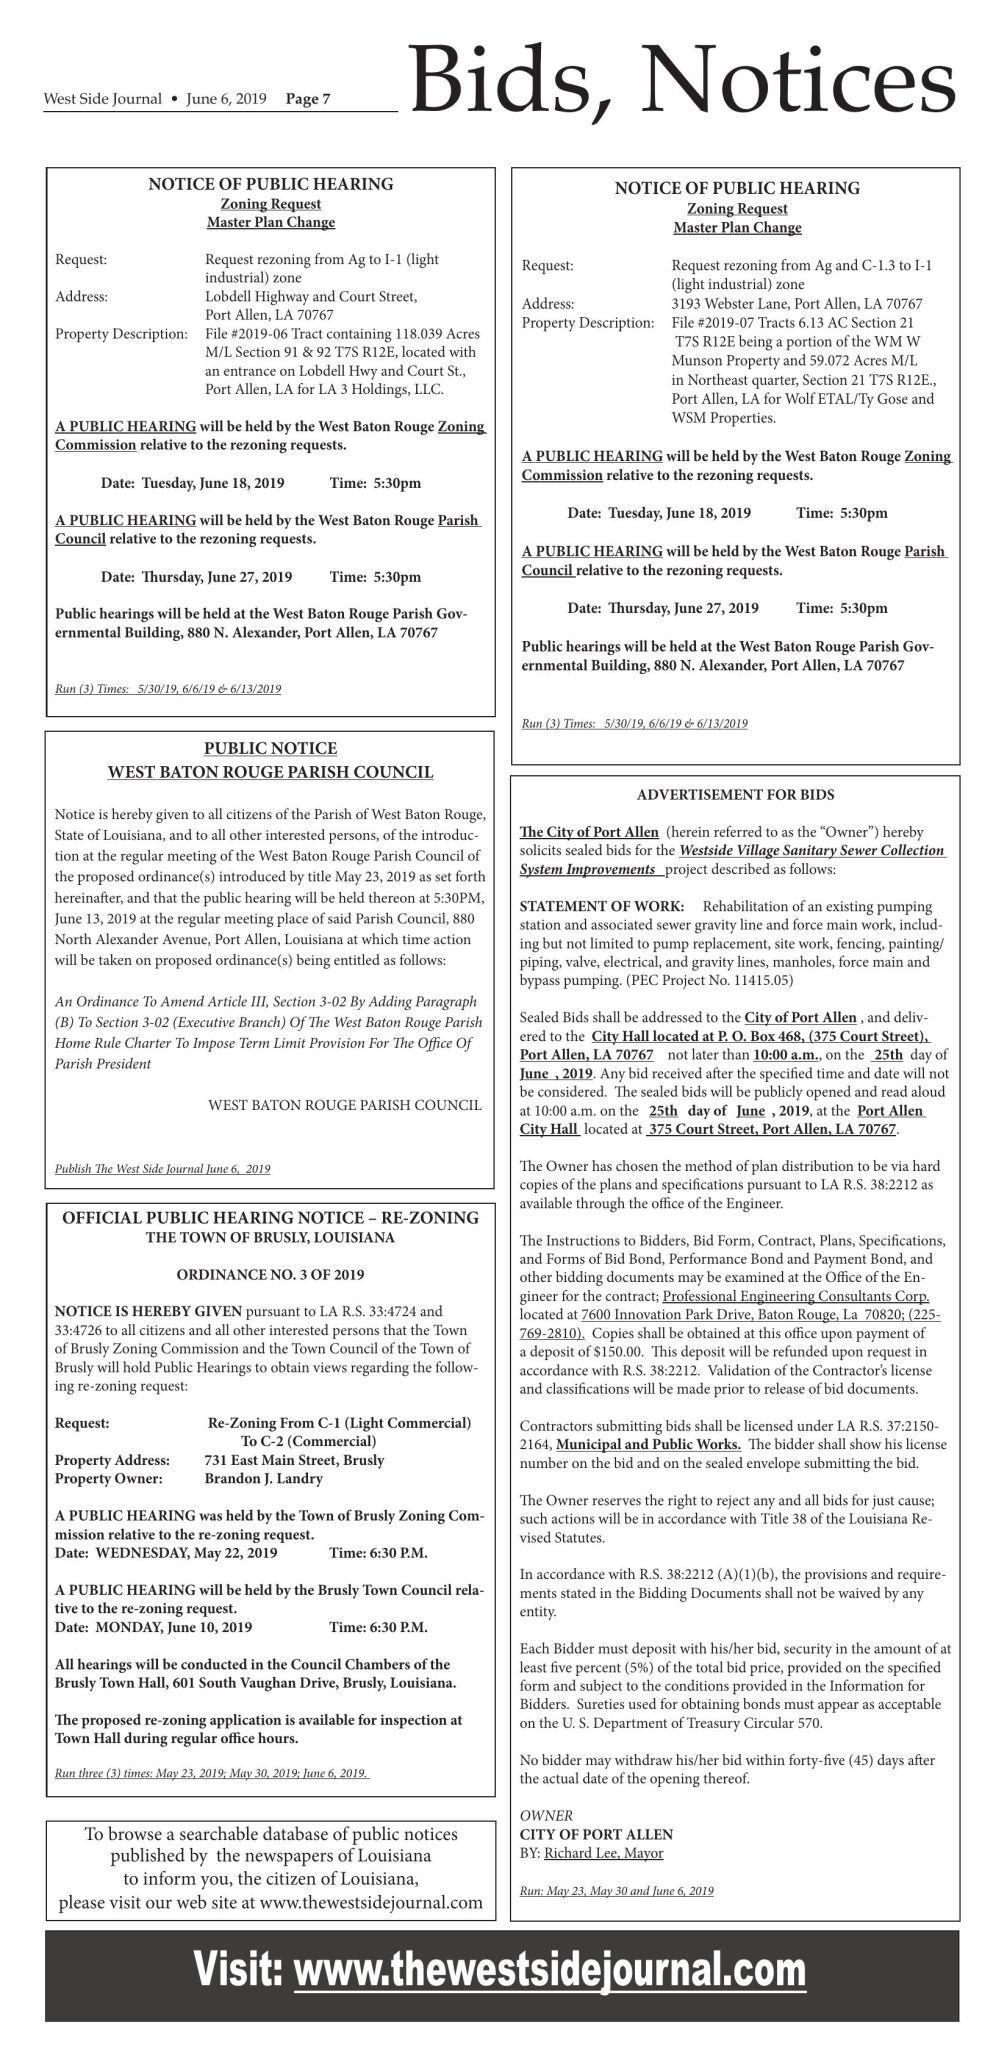 Bids & Notices 06.06.19